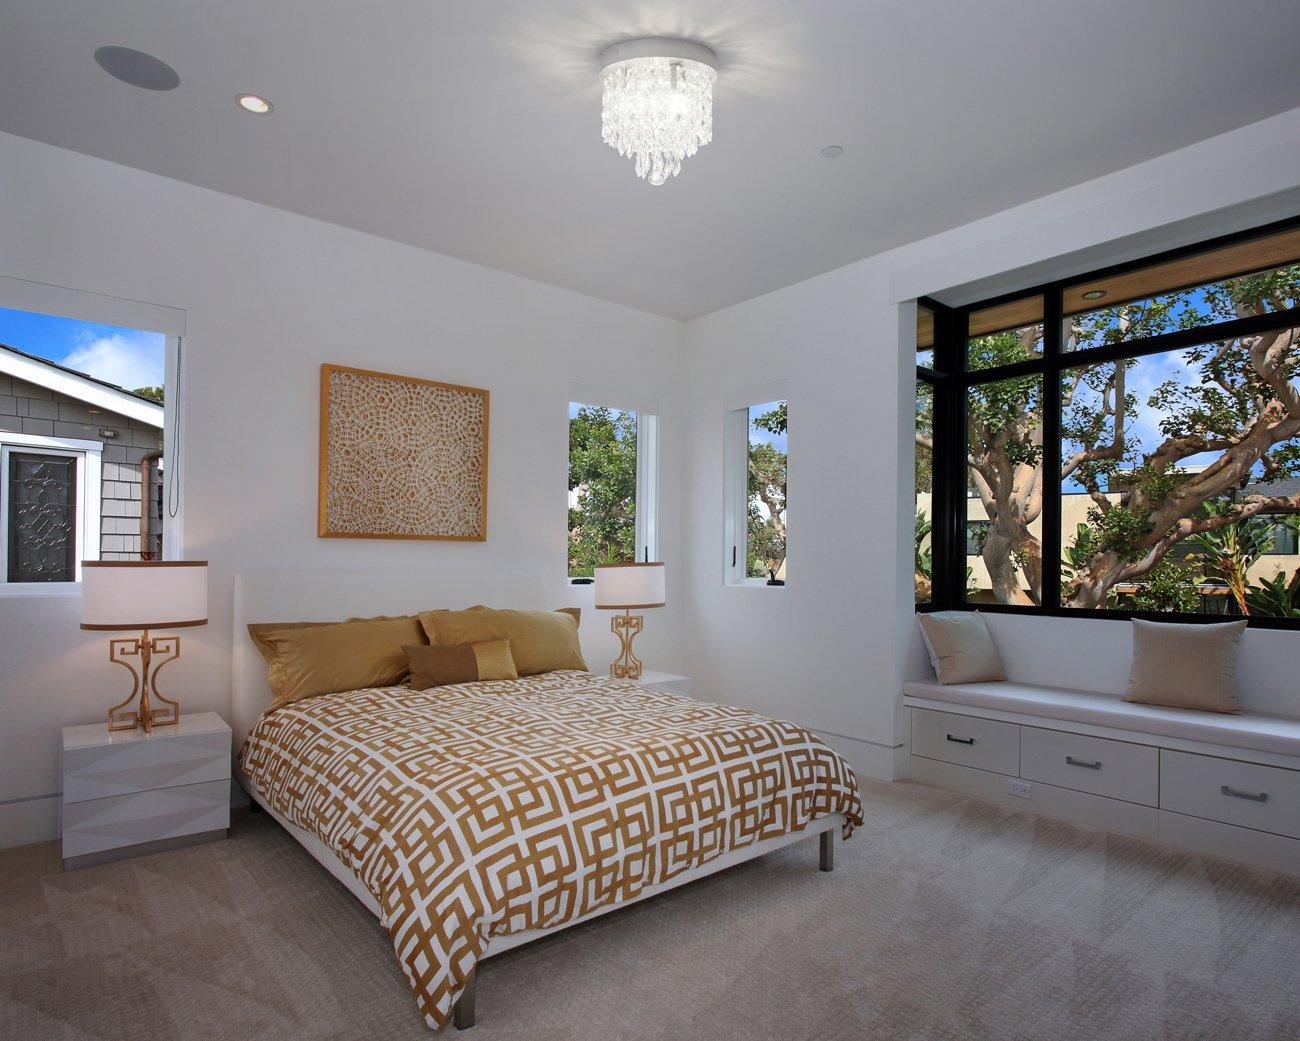 SHINE HAI Crystal Chandelier, 3-light Modern Flush Mount Ceiling Pendant Light H9.45'' X W8.66'' for Bedroom, Living Room, Dining Room, Kitchen, Hallway by SHINE HAI (Image #6)